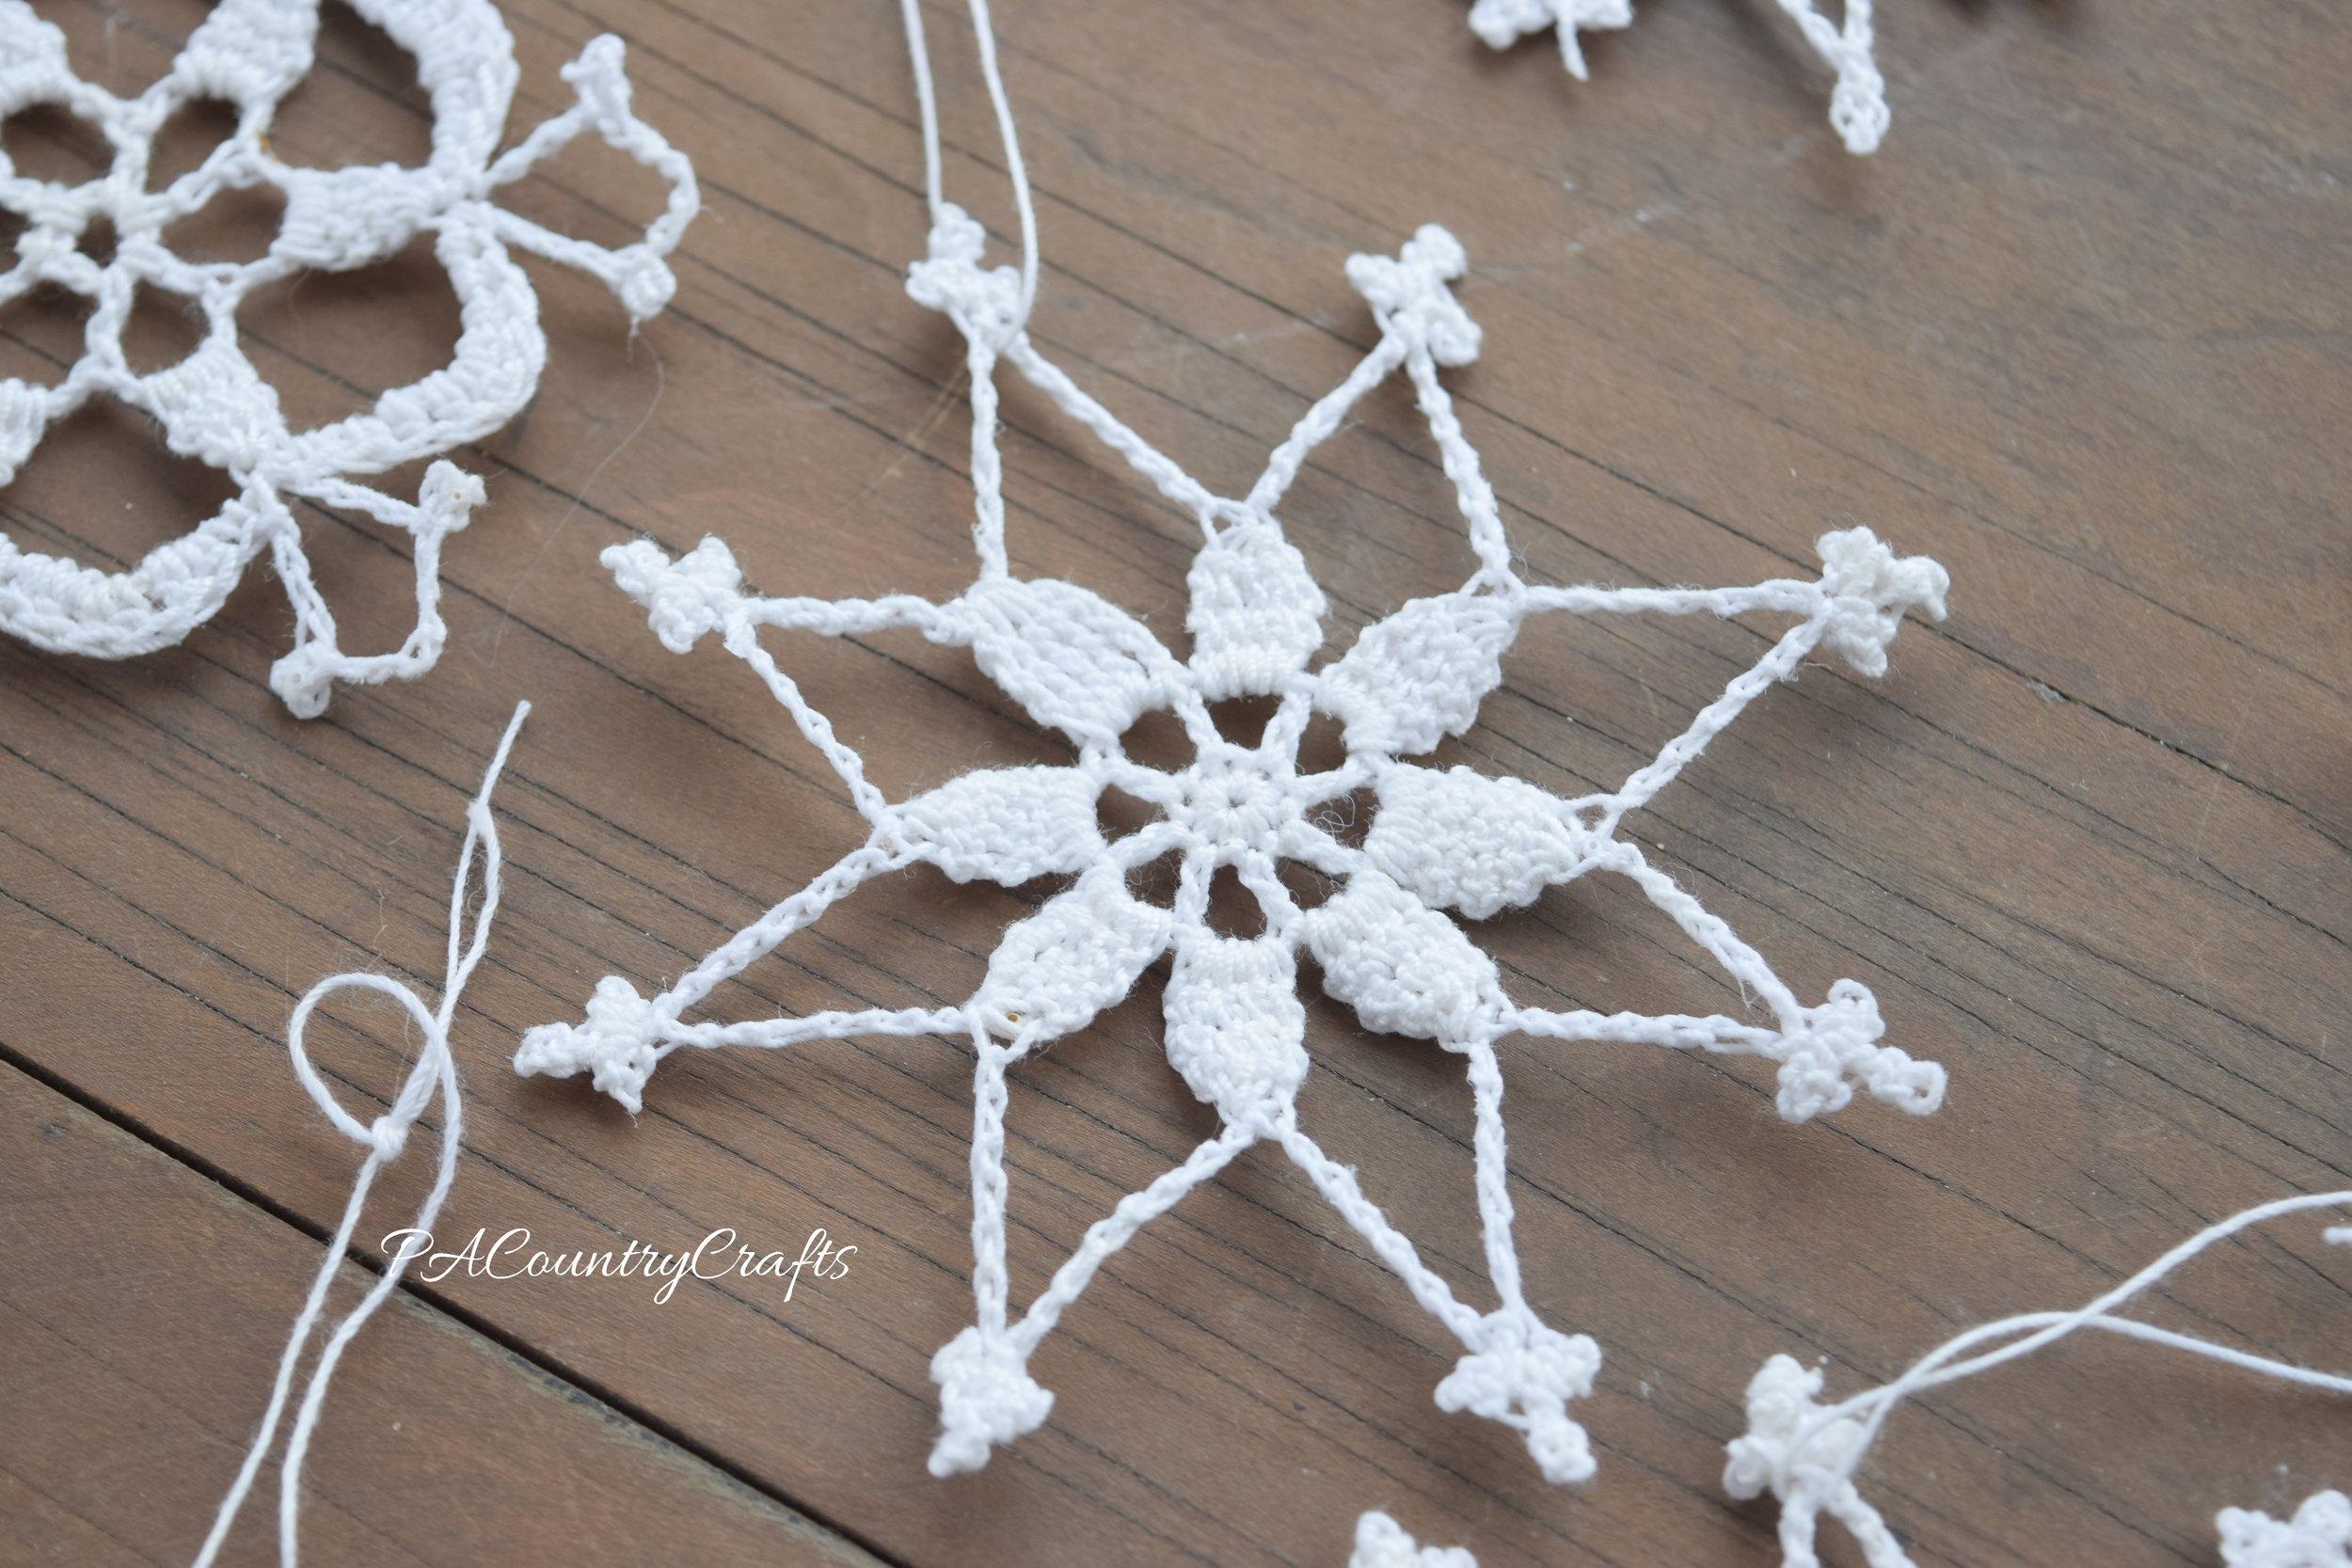 I love this star shaped crochet snowflake!